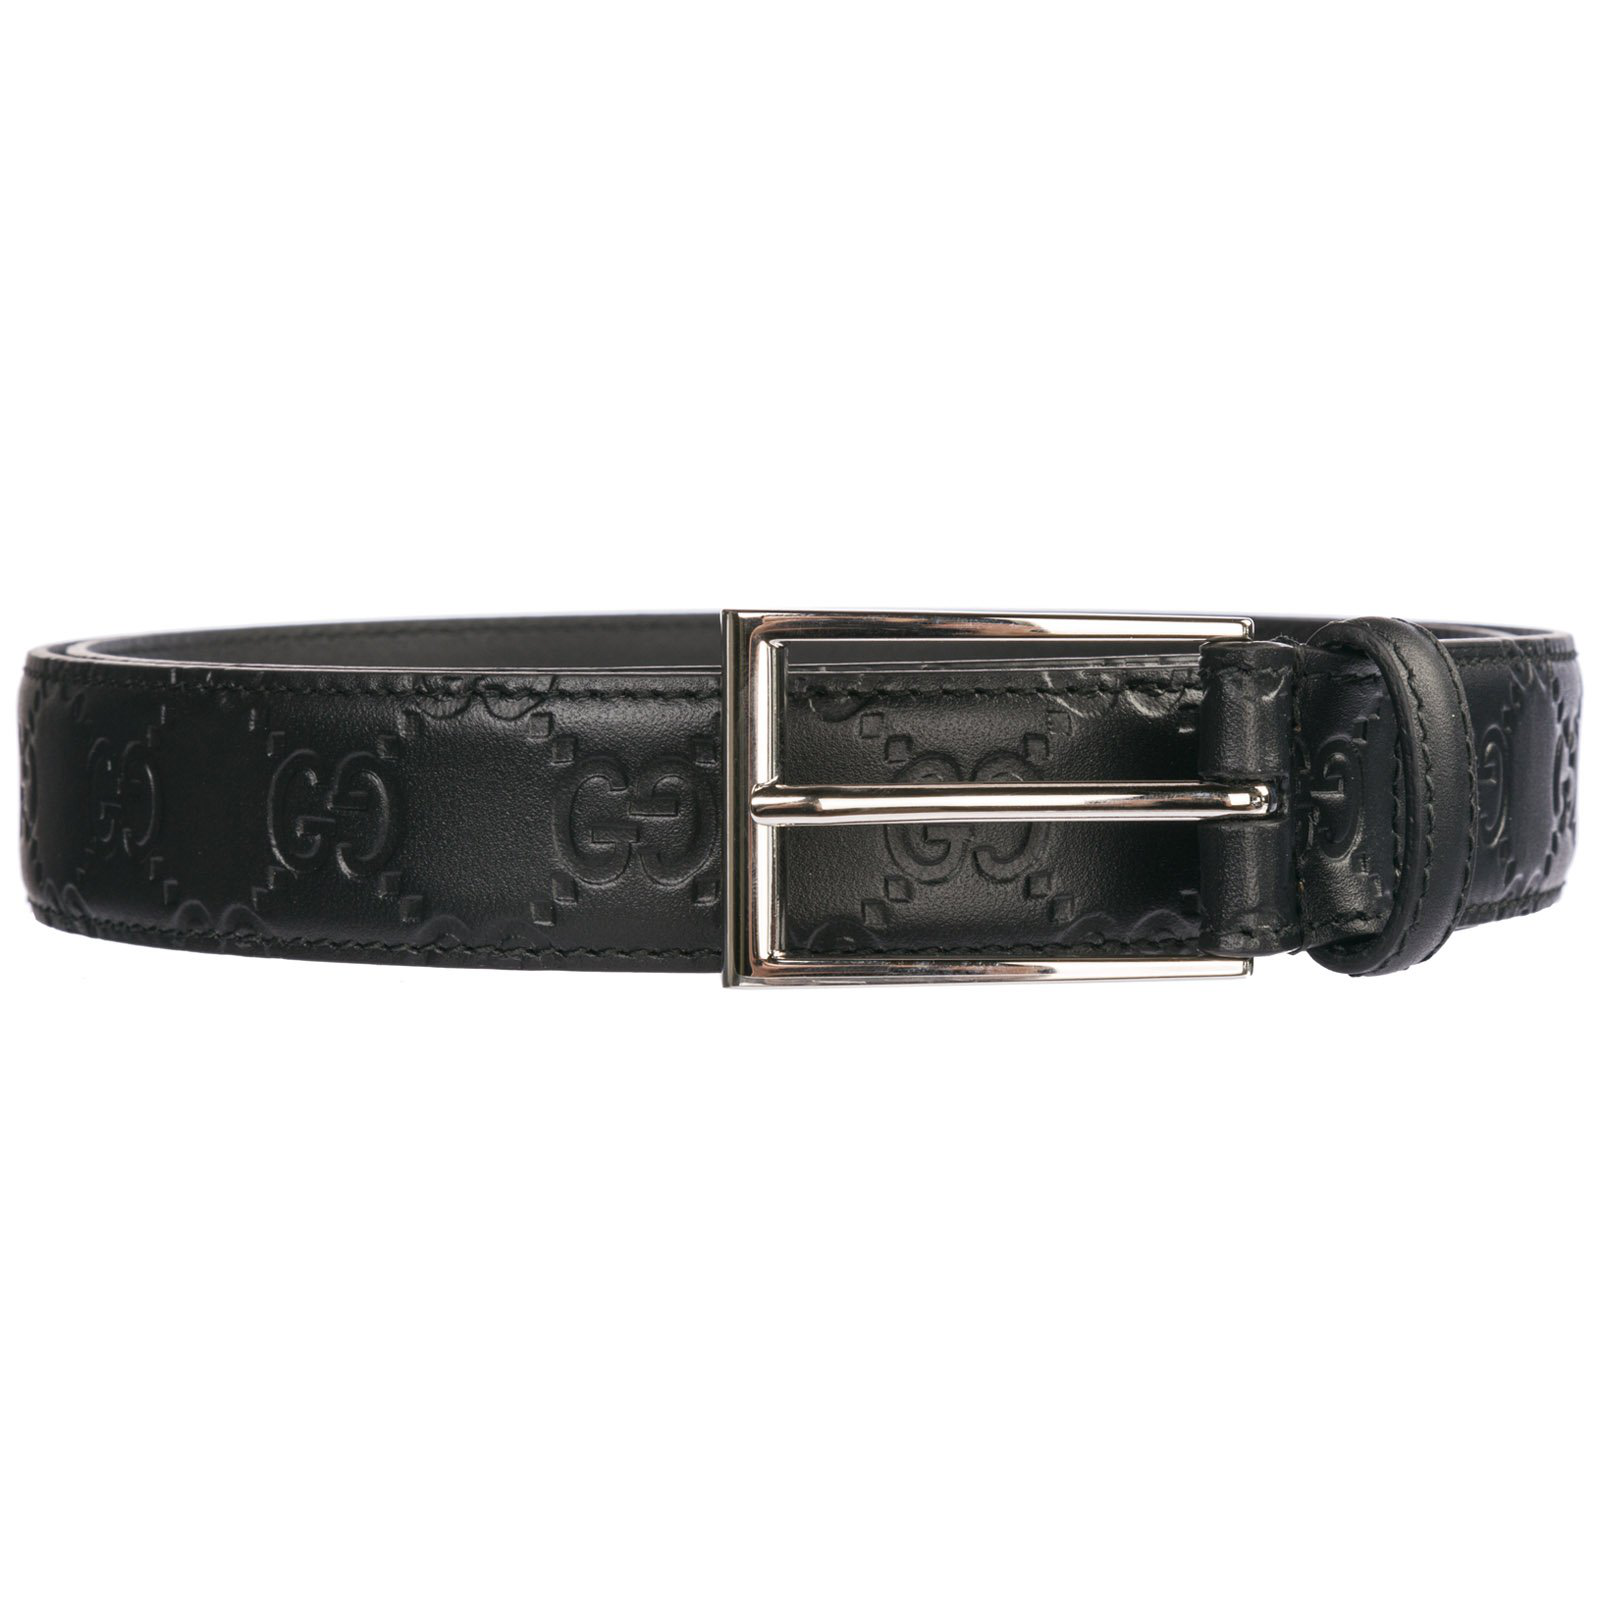 f0be98f8563 Gucci Genuine Leather Belt In Nero